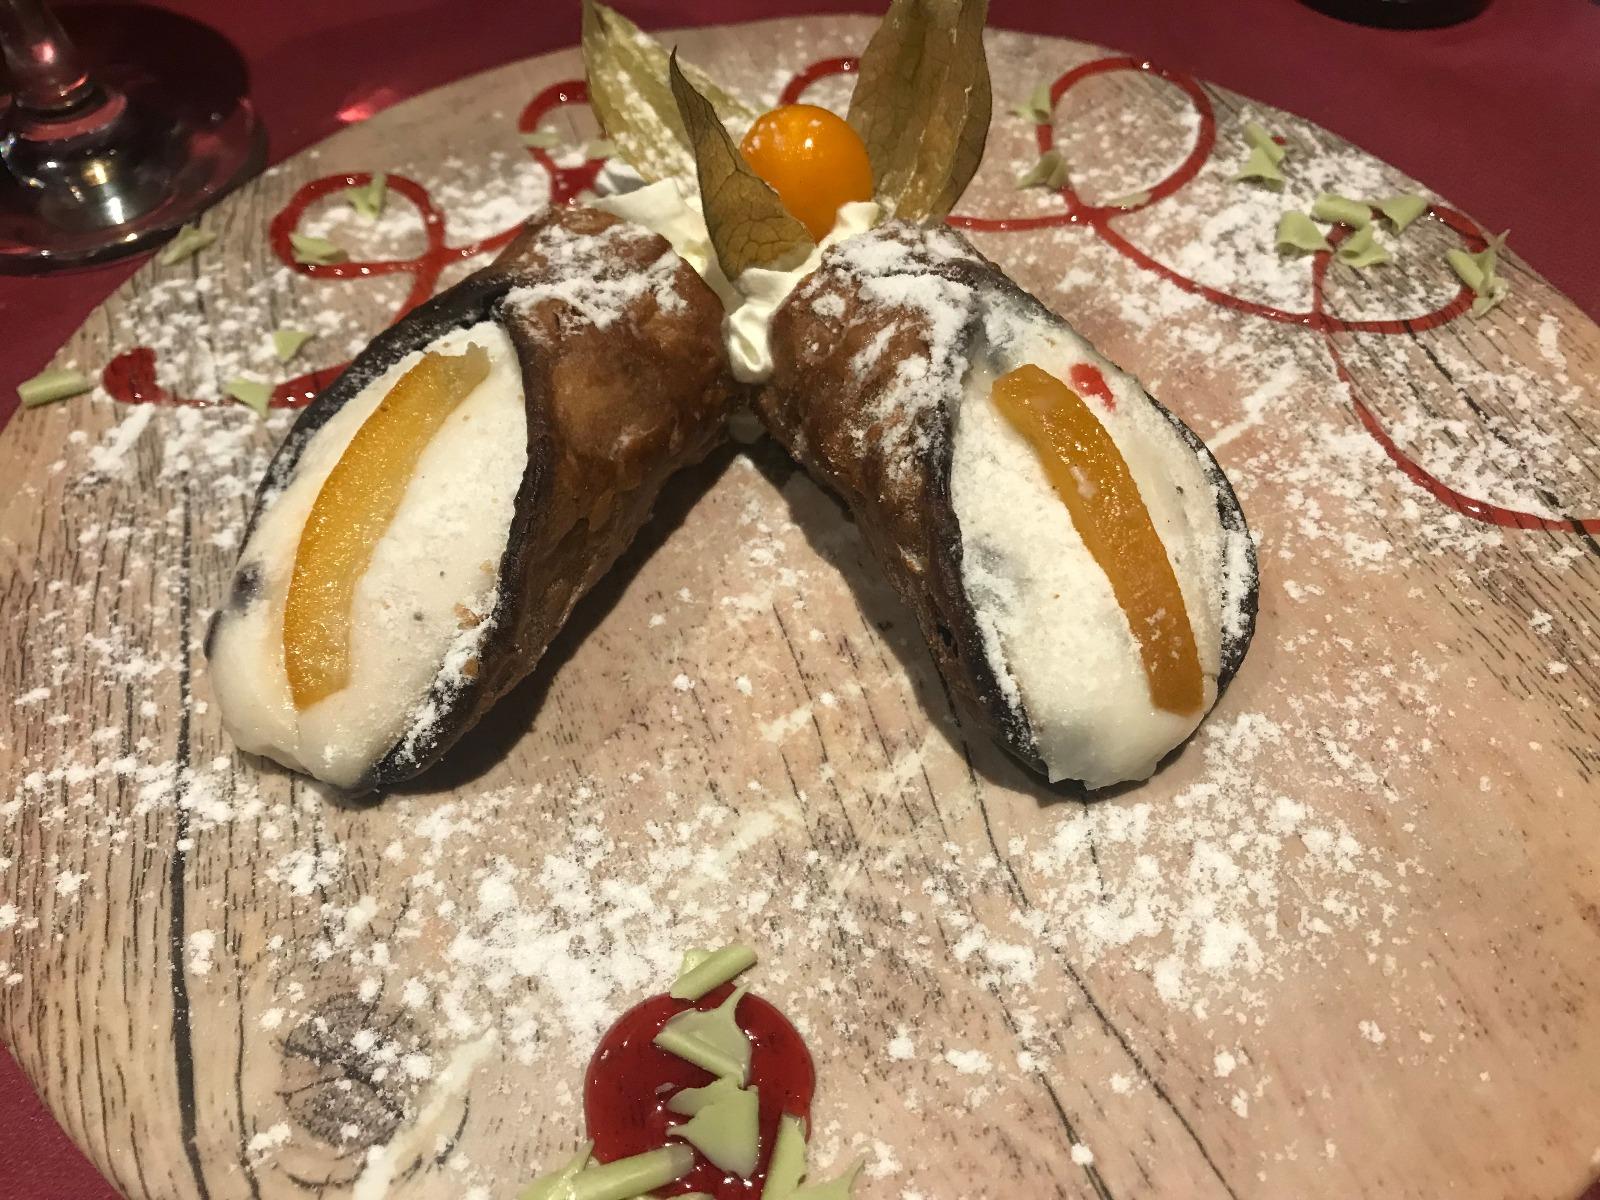 palma-mallorca-bonnes-adresses-restaurant-il-tano-dessert